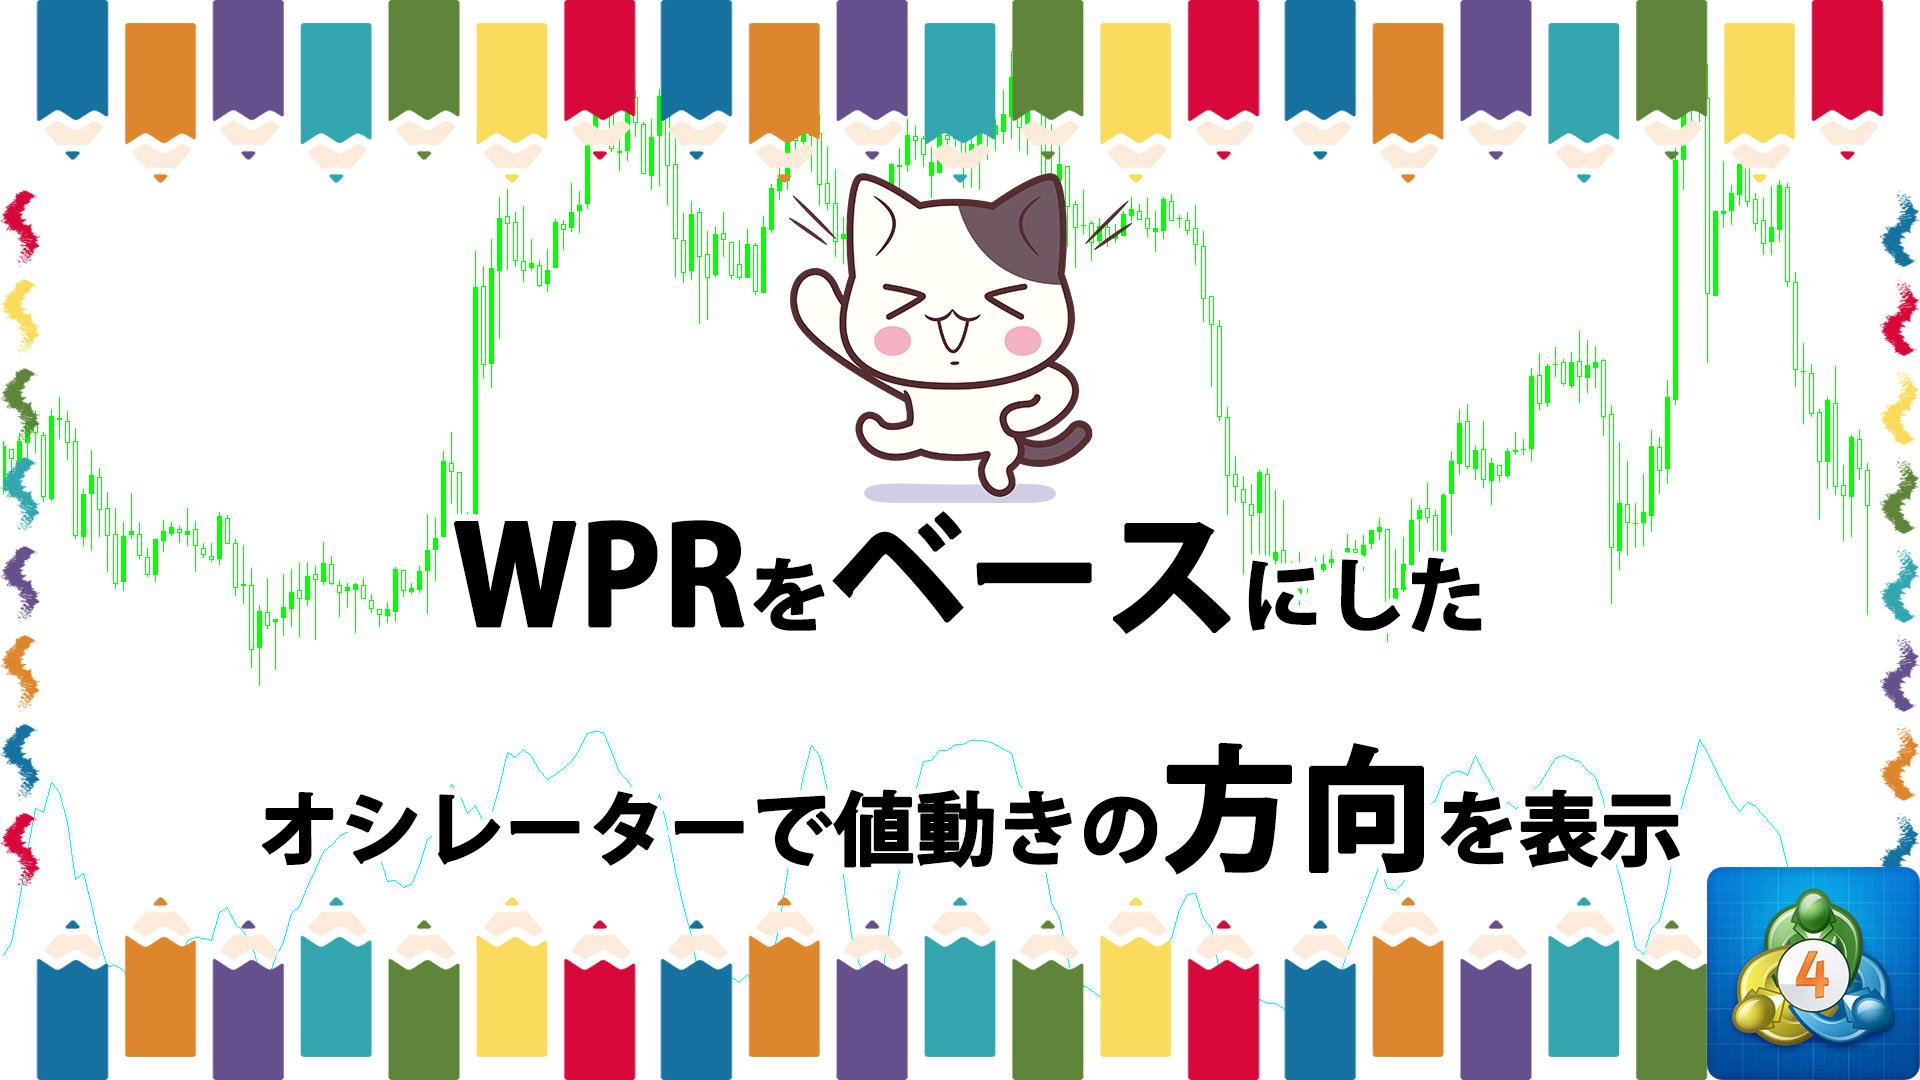 WPRをベースにしたオシレーターで値動きの方向を表示するMT4インジケーター「VininI_MV_MA_WPR(v1)」